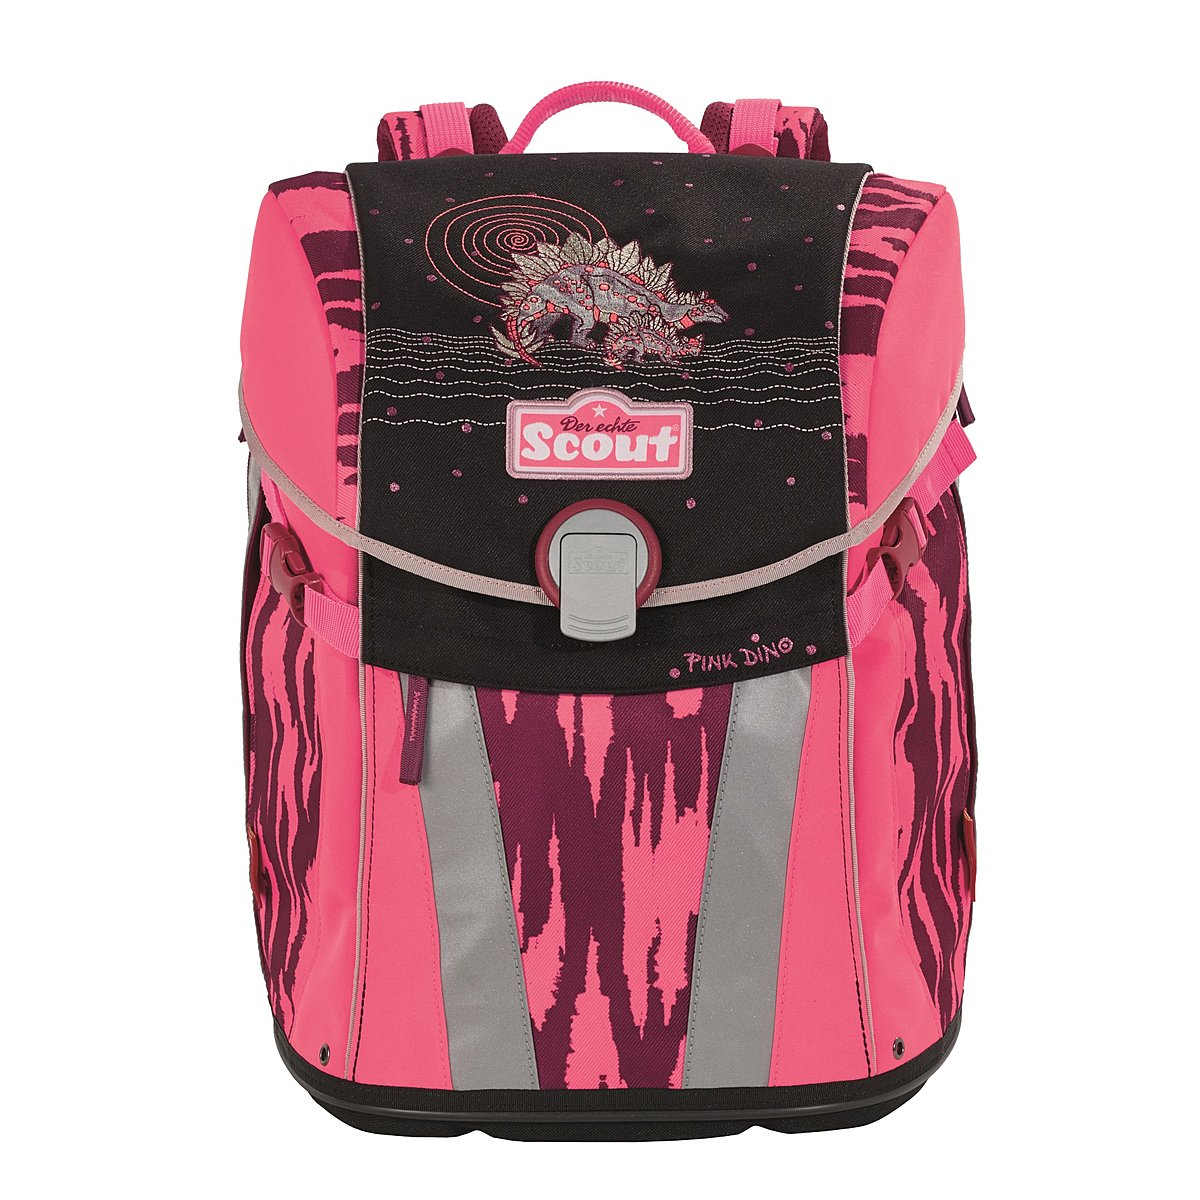 scout schulrucksack sunny pink dino f r die grundschule. Black Bedroom Furniture Sets. Home Design Ideas